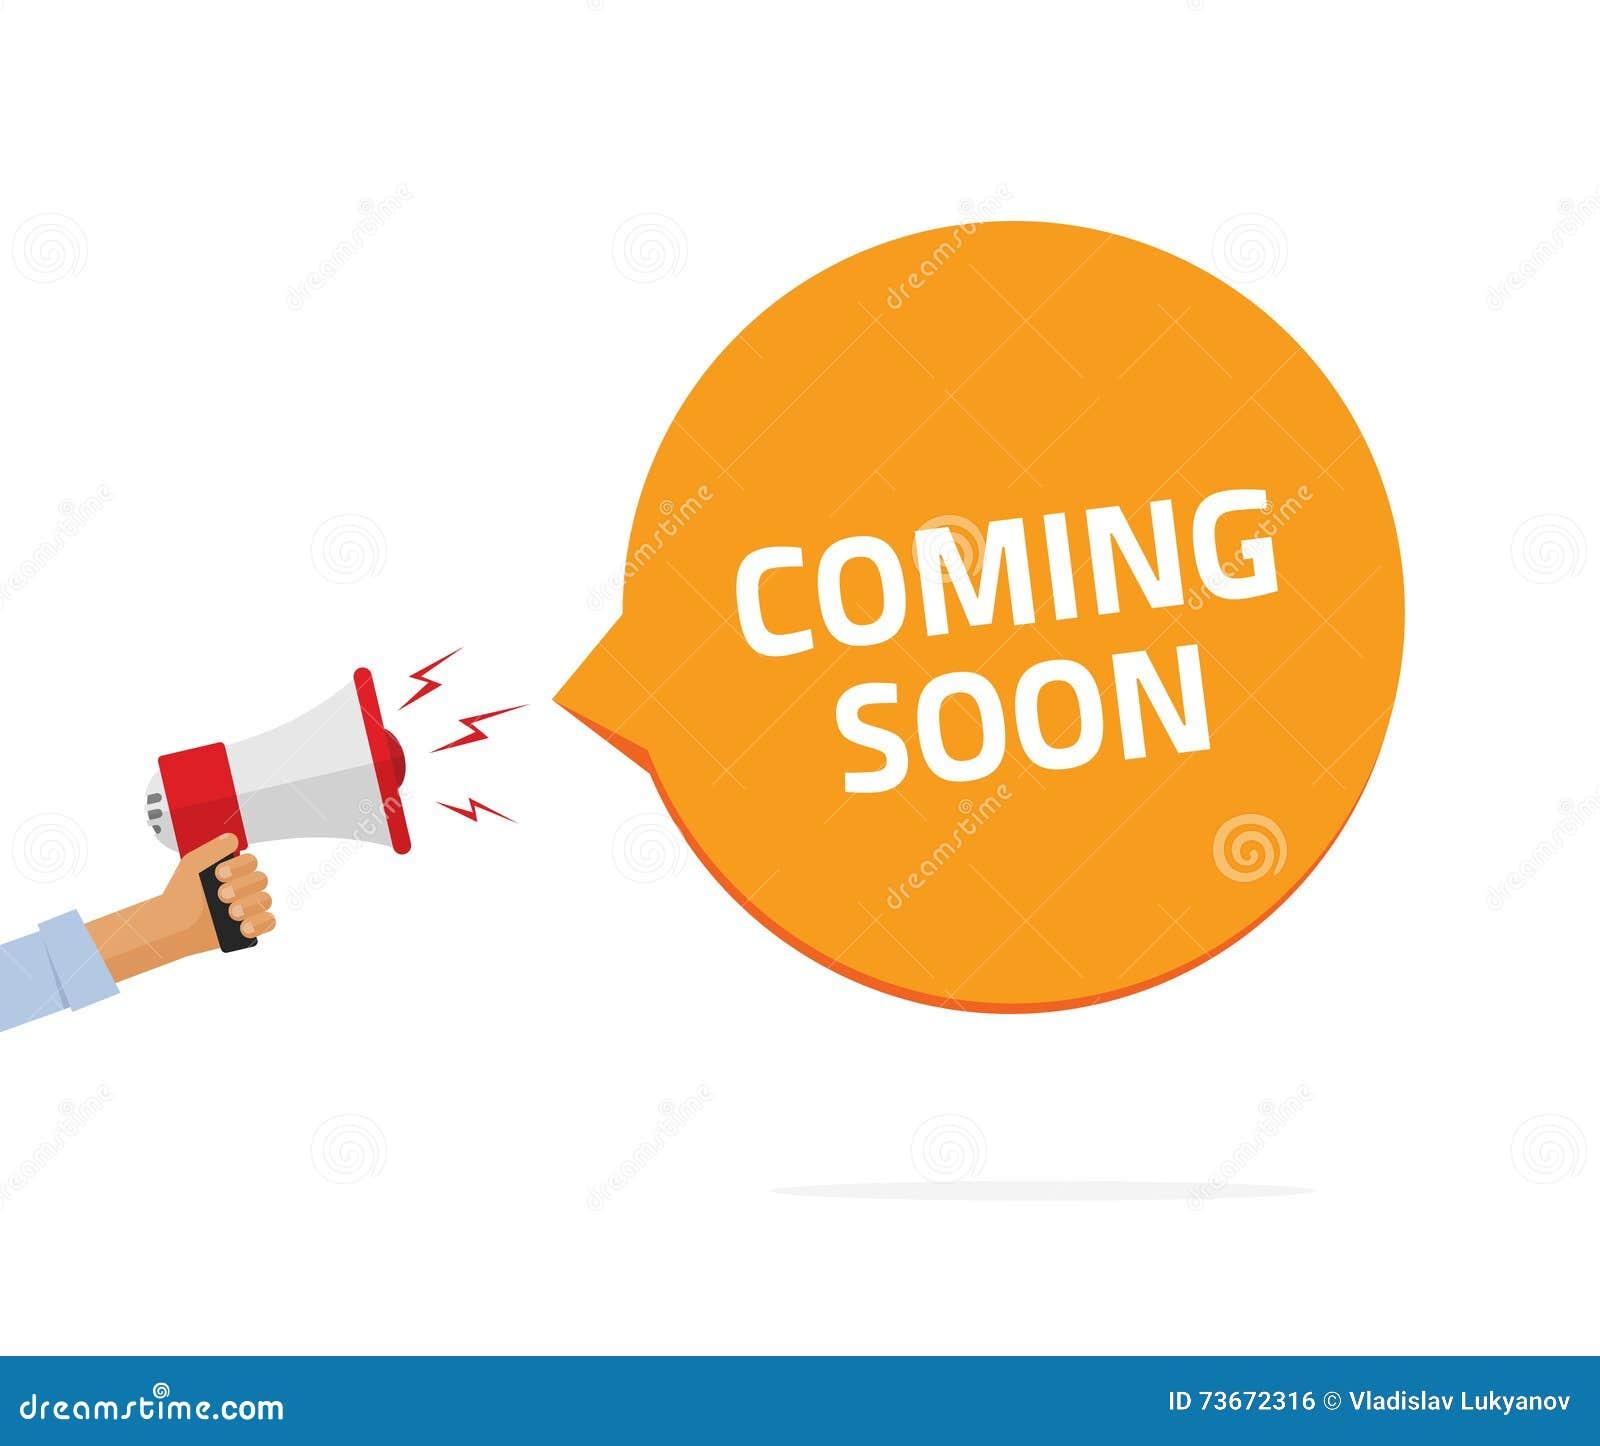 Coming soon sing vector illustration, hand holding bullhorn, babble speech